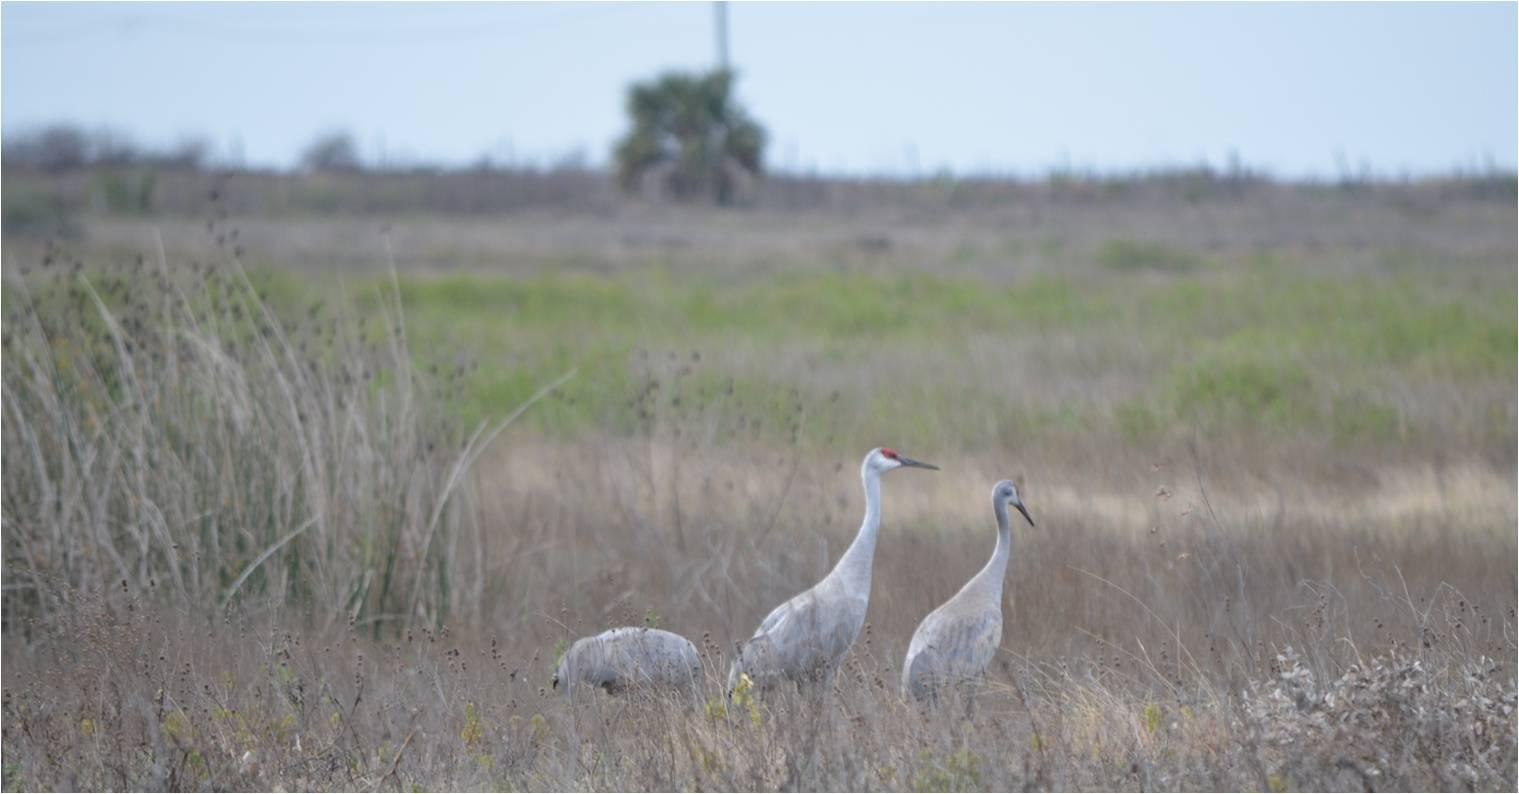 Prairies of the Greater Houston Region